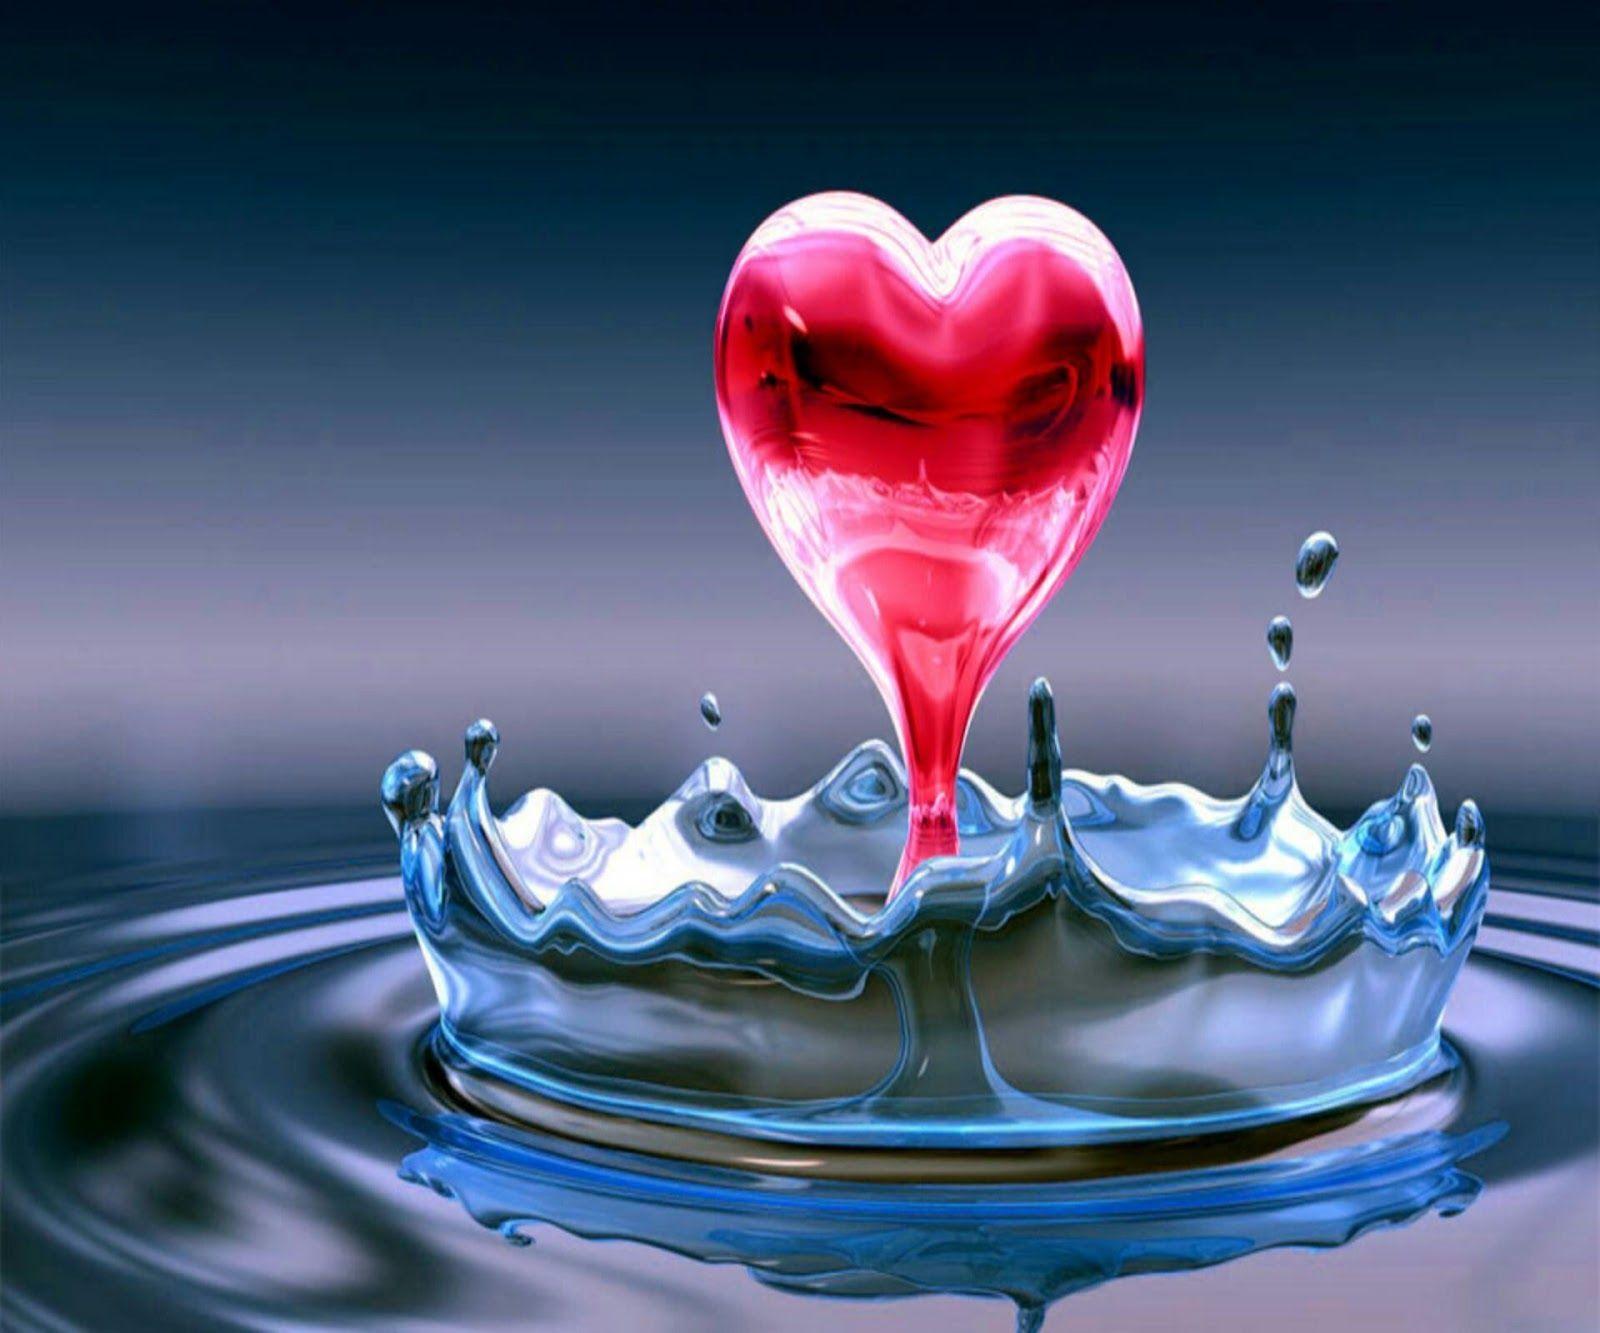 Wallpapers Samsung Galaxy Tab 10 1 Water Heart Wallpaper Love Quotes Wallpaper Love Wallpaper